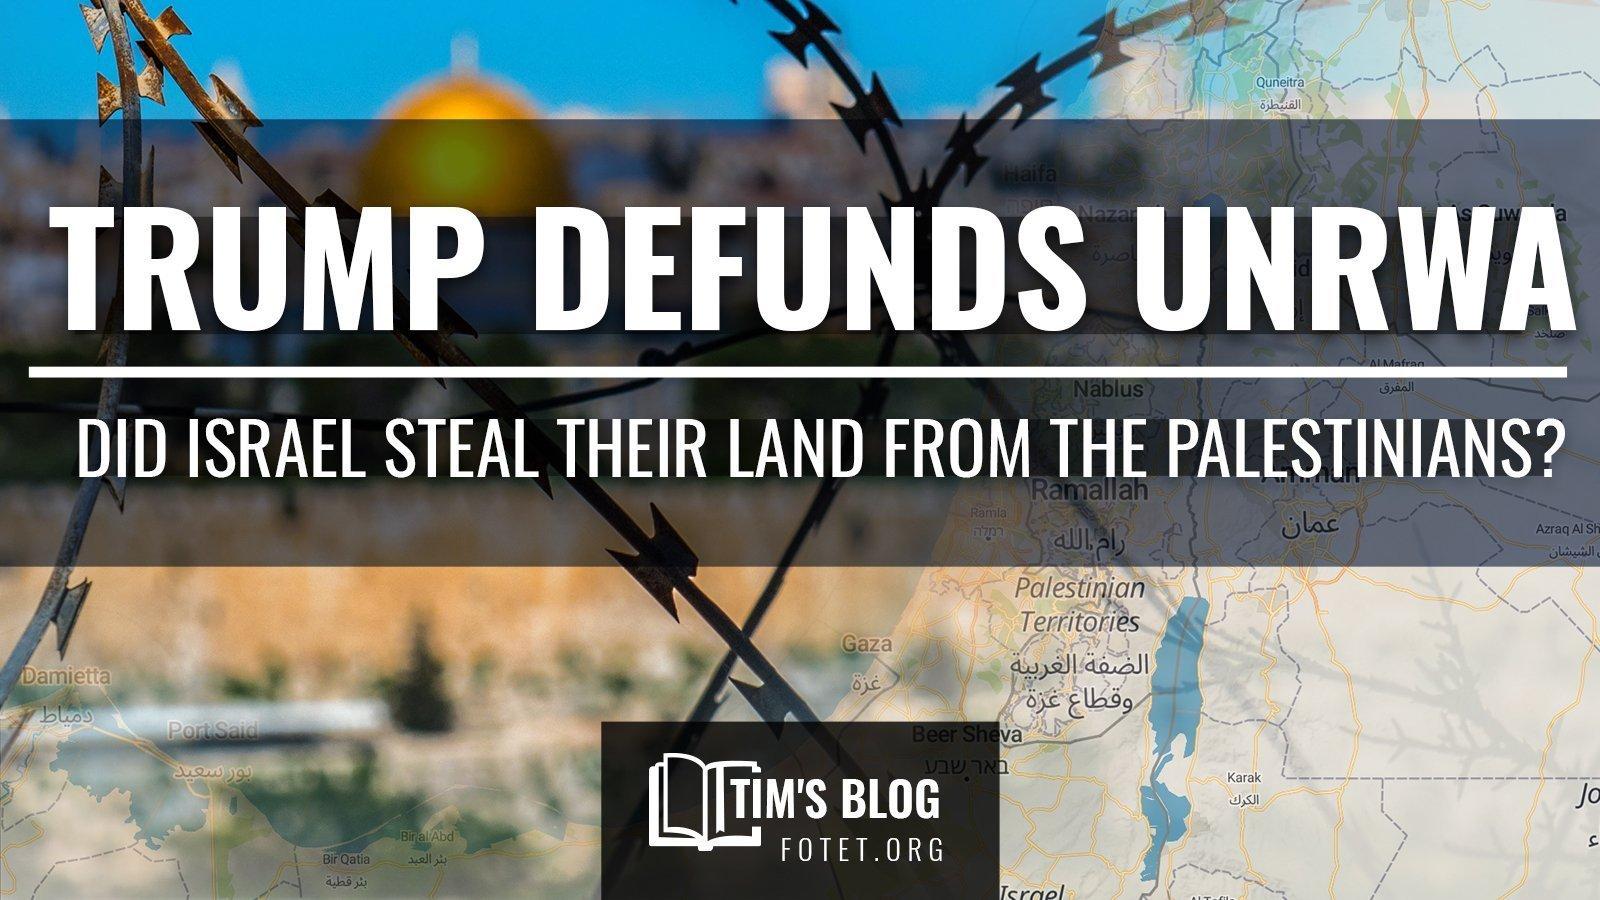 Trump Defunds UNRWA